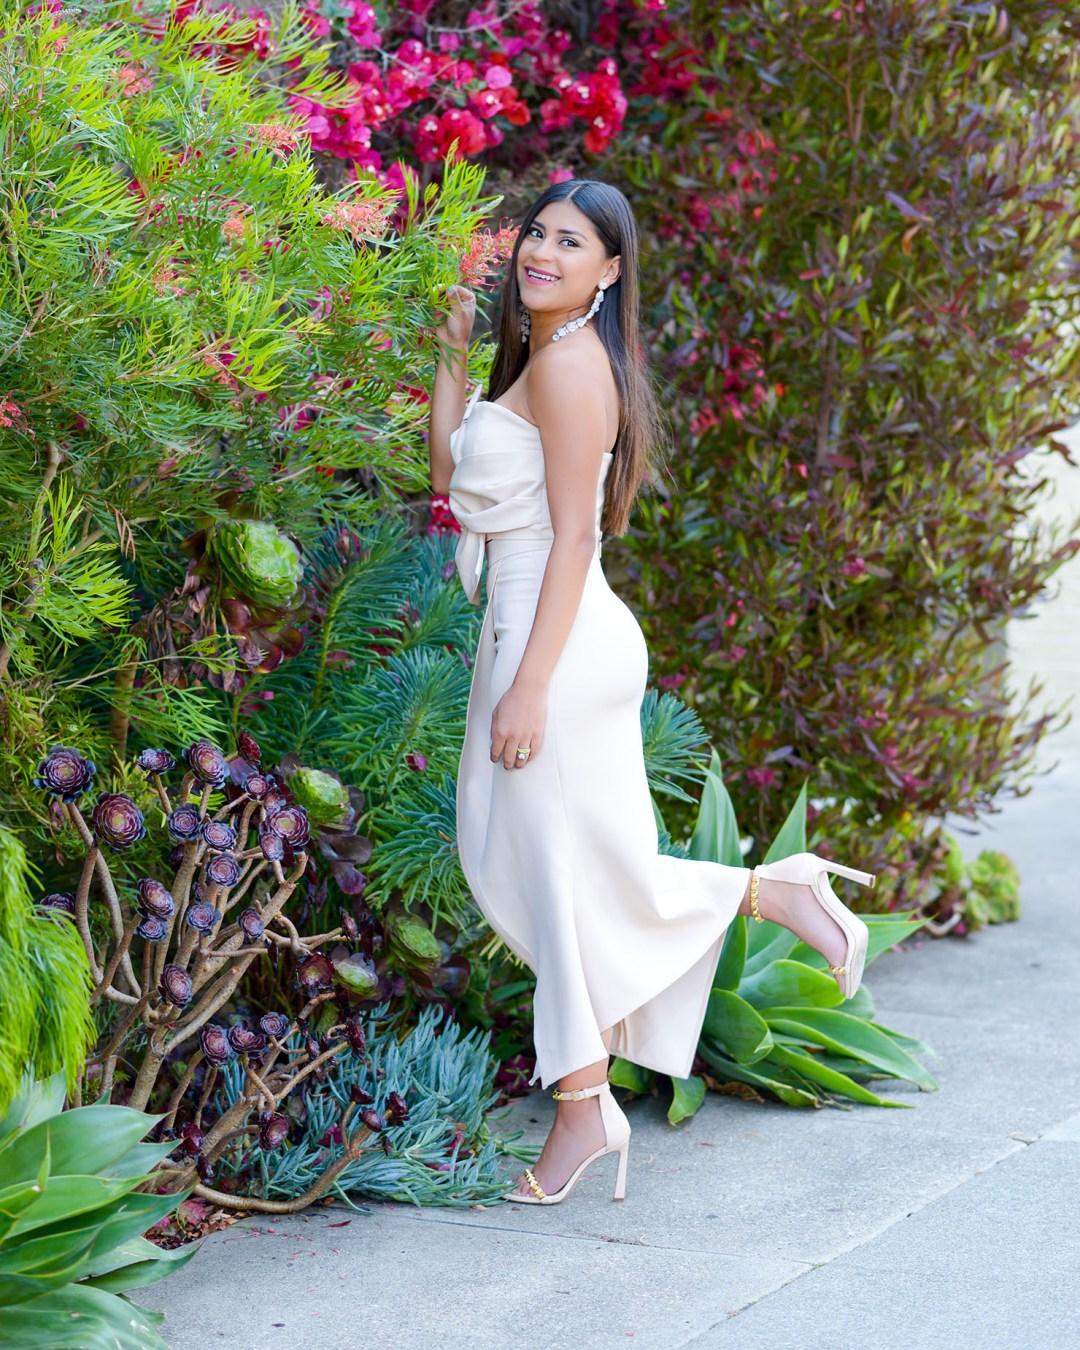 Lifestyle blogger Kelsey Kaplan of Kelsey Kaplan Fashion wearing Beige Two-Piece Set and Stuart Weitzman sandals